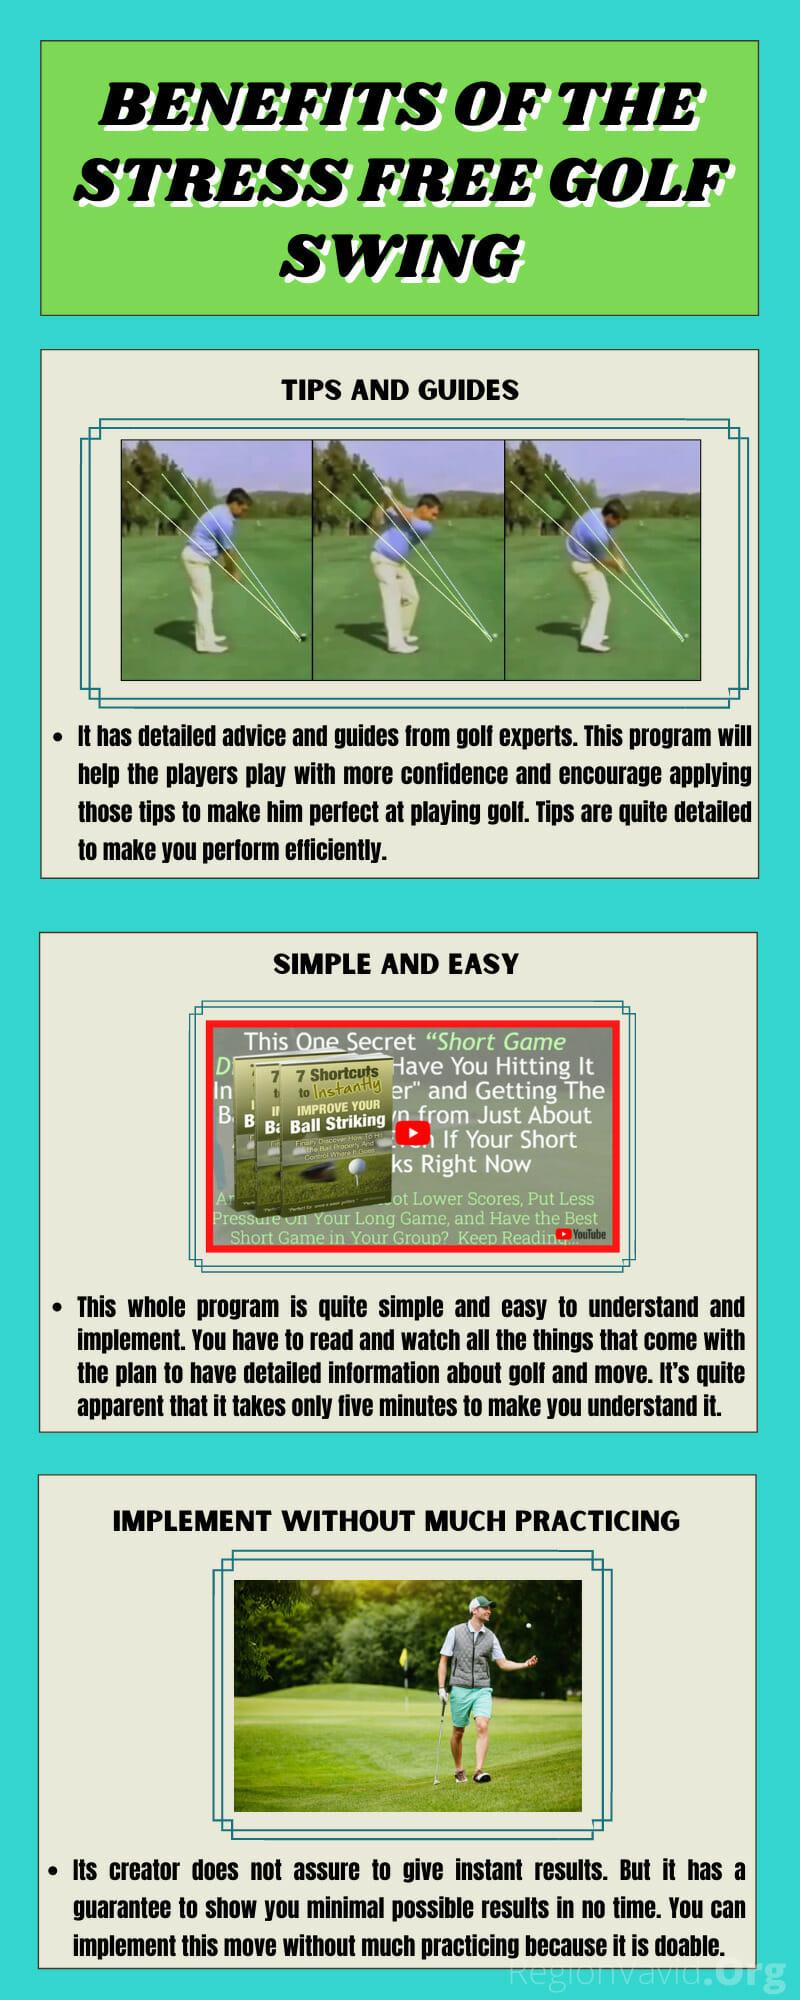 Stress Free Gold Swing Benefits